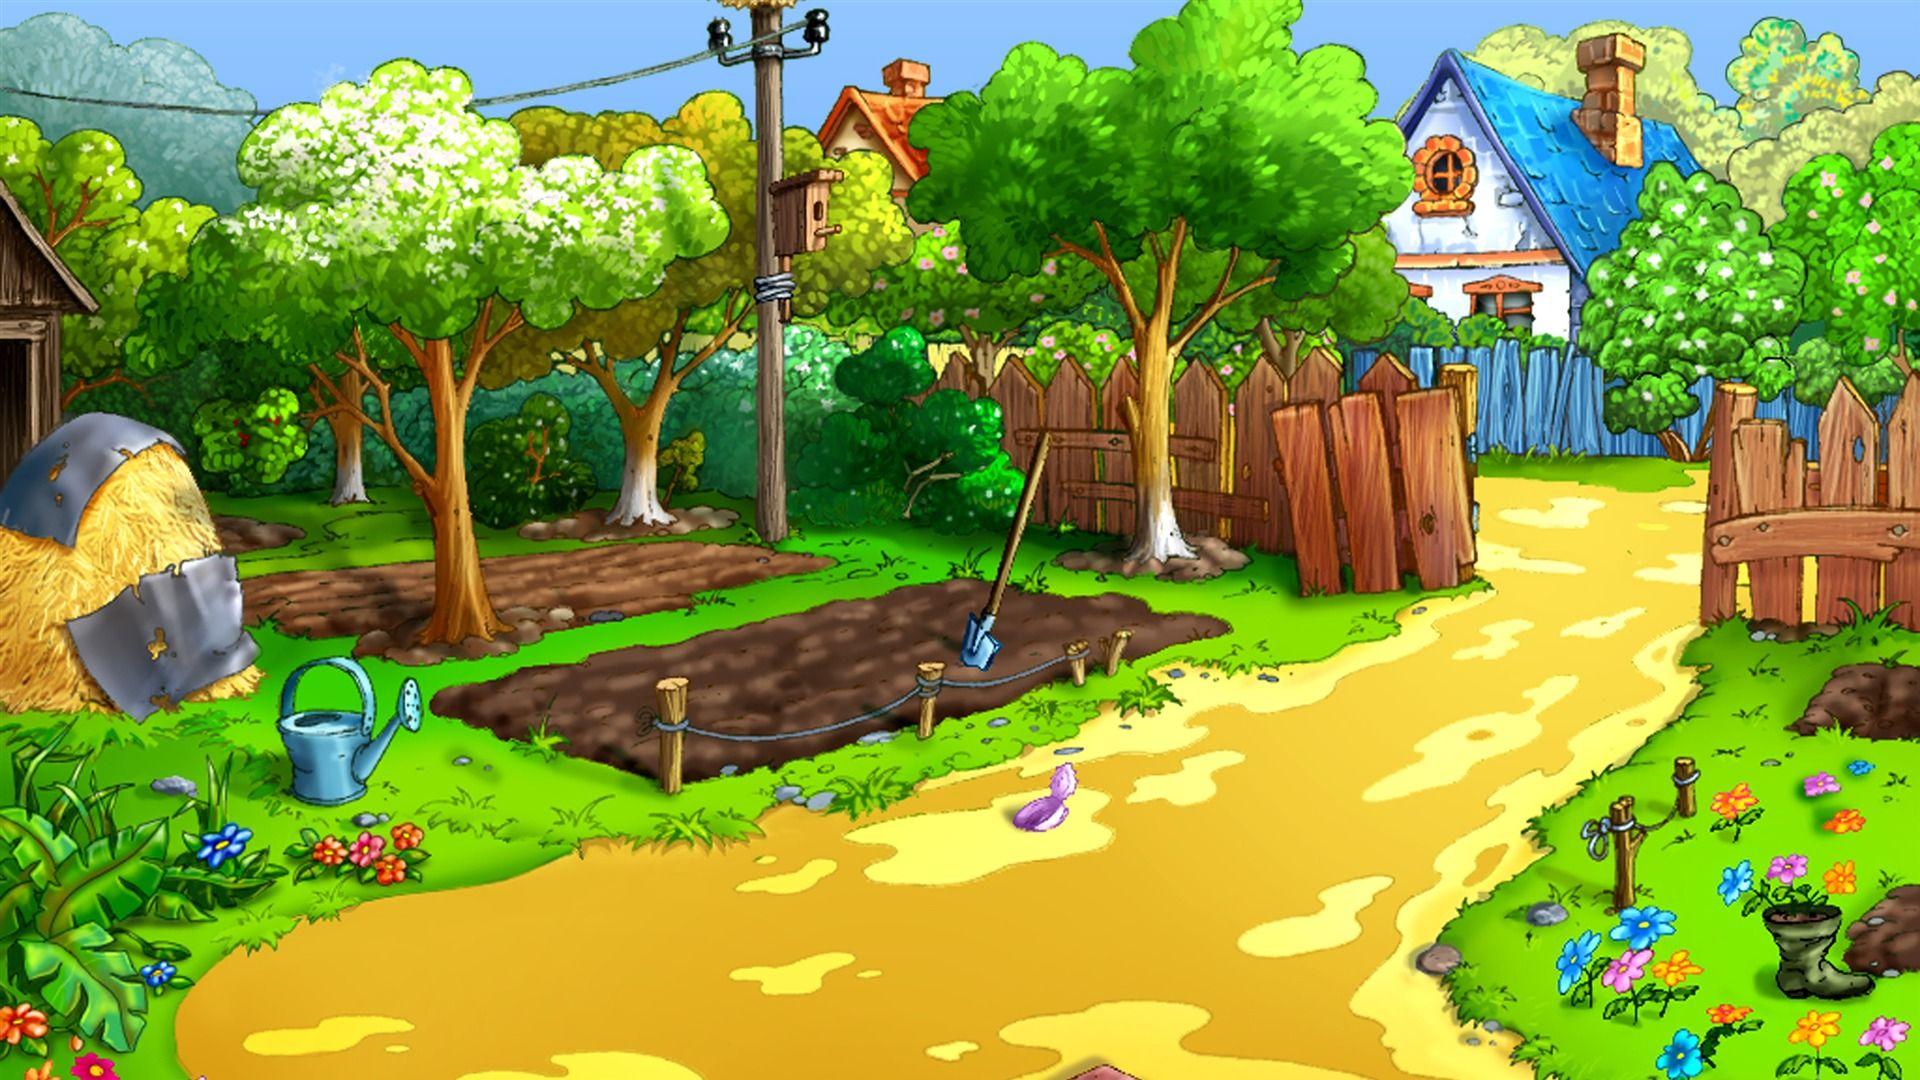 Cartoon Nature Background Wallpaper